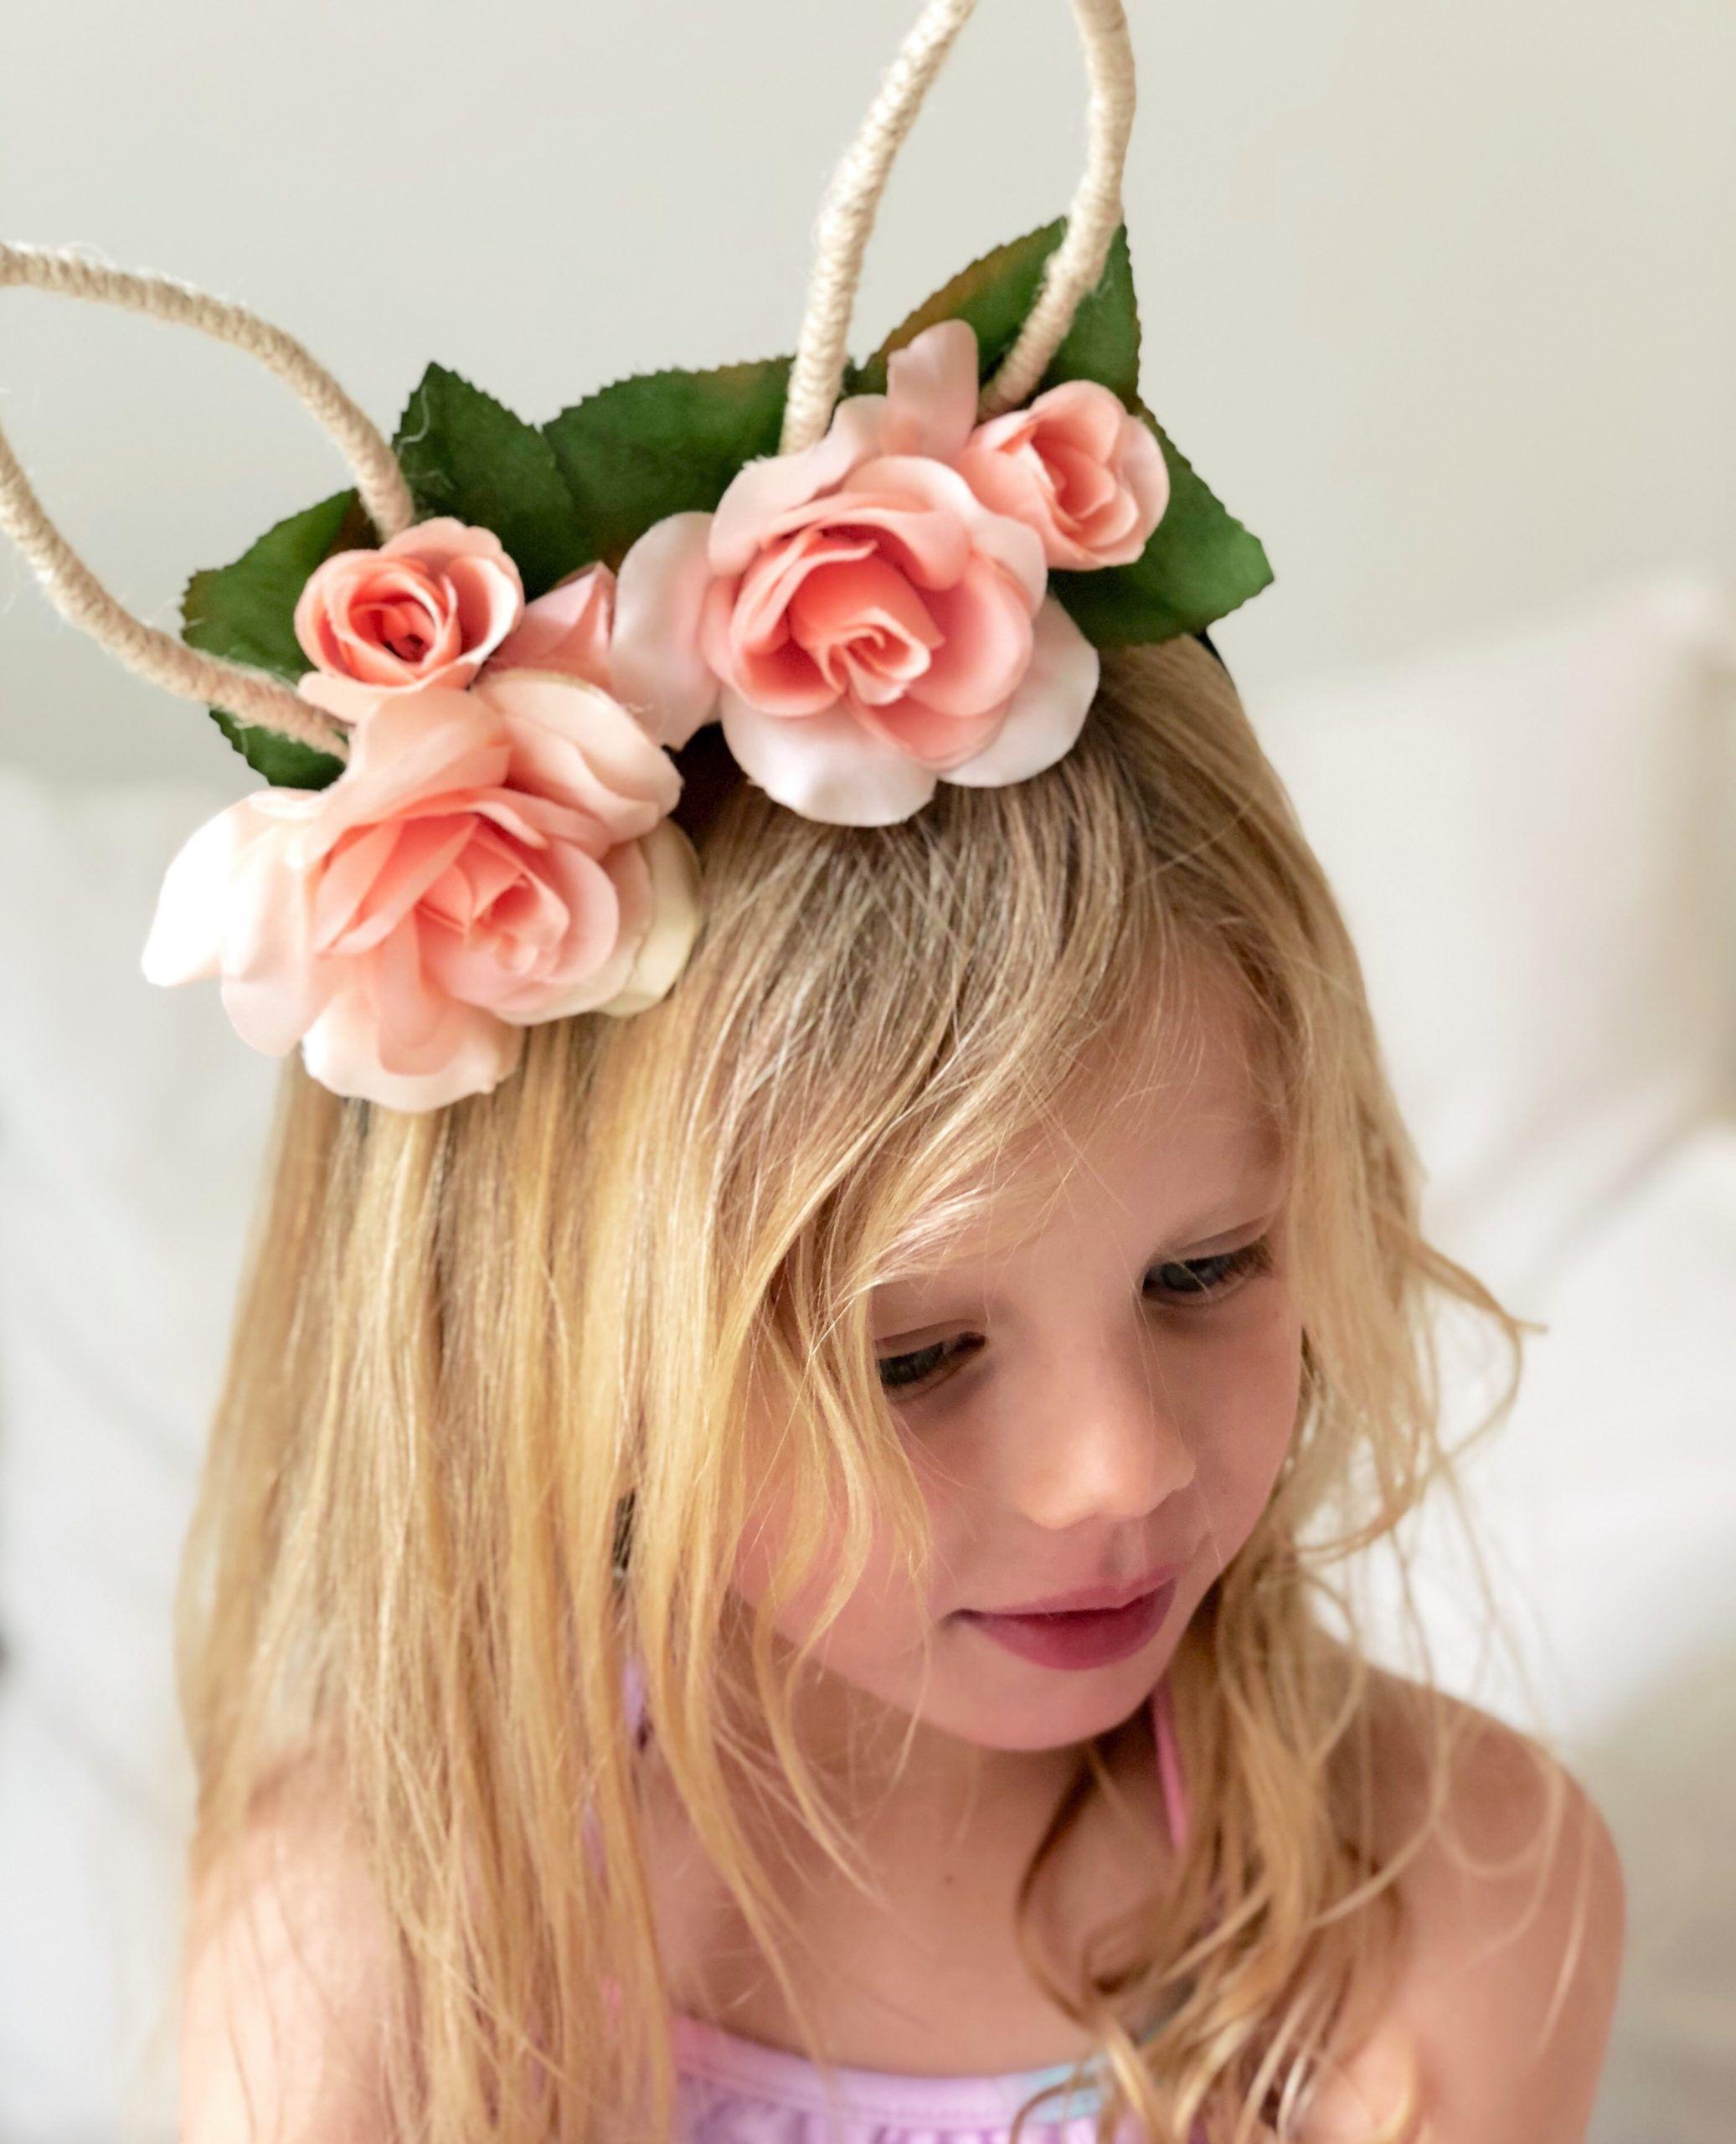 Pinterest Worthy Diy Easter Headband Women Of Today In 2021 Easter Headbands Easter Hat Parade Easter Hair